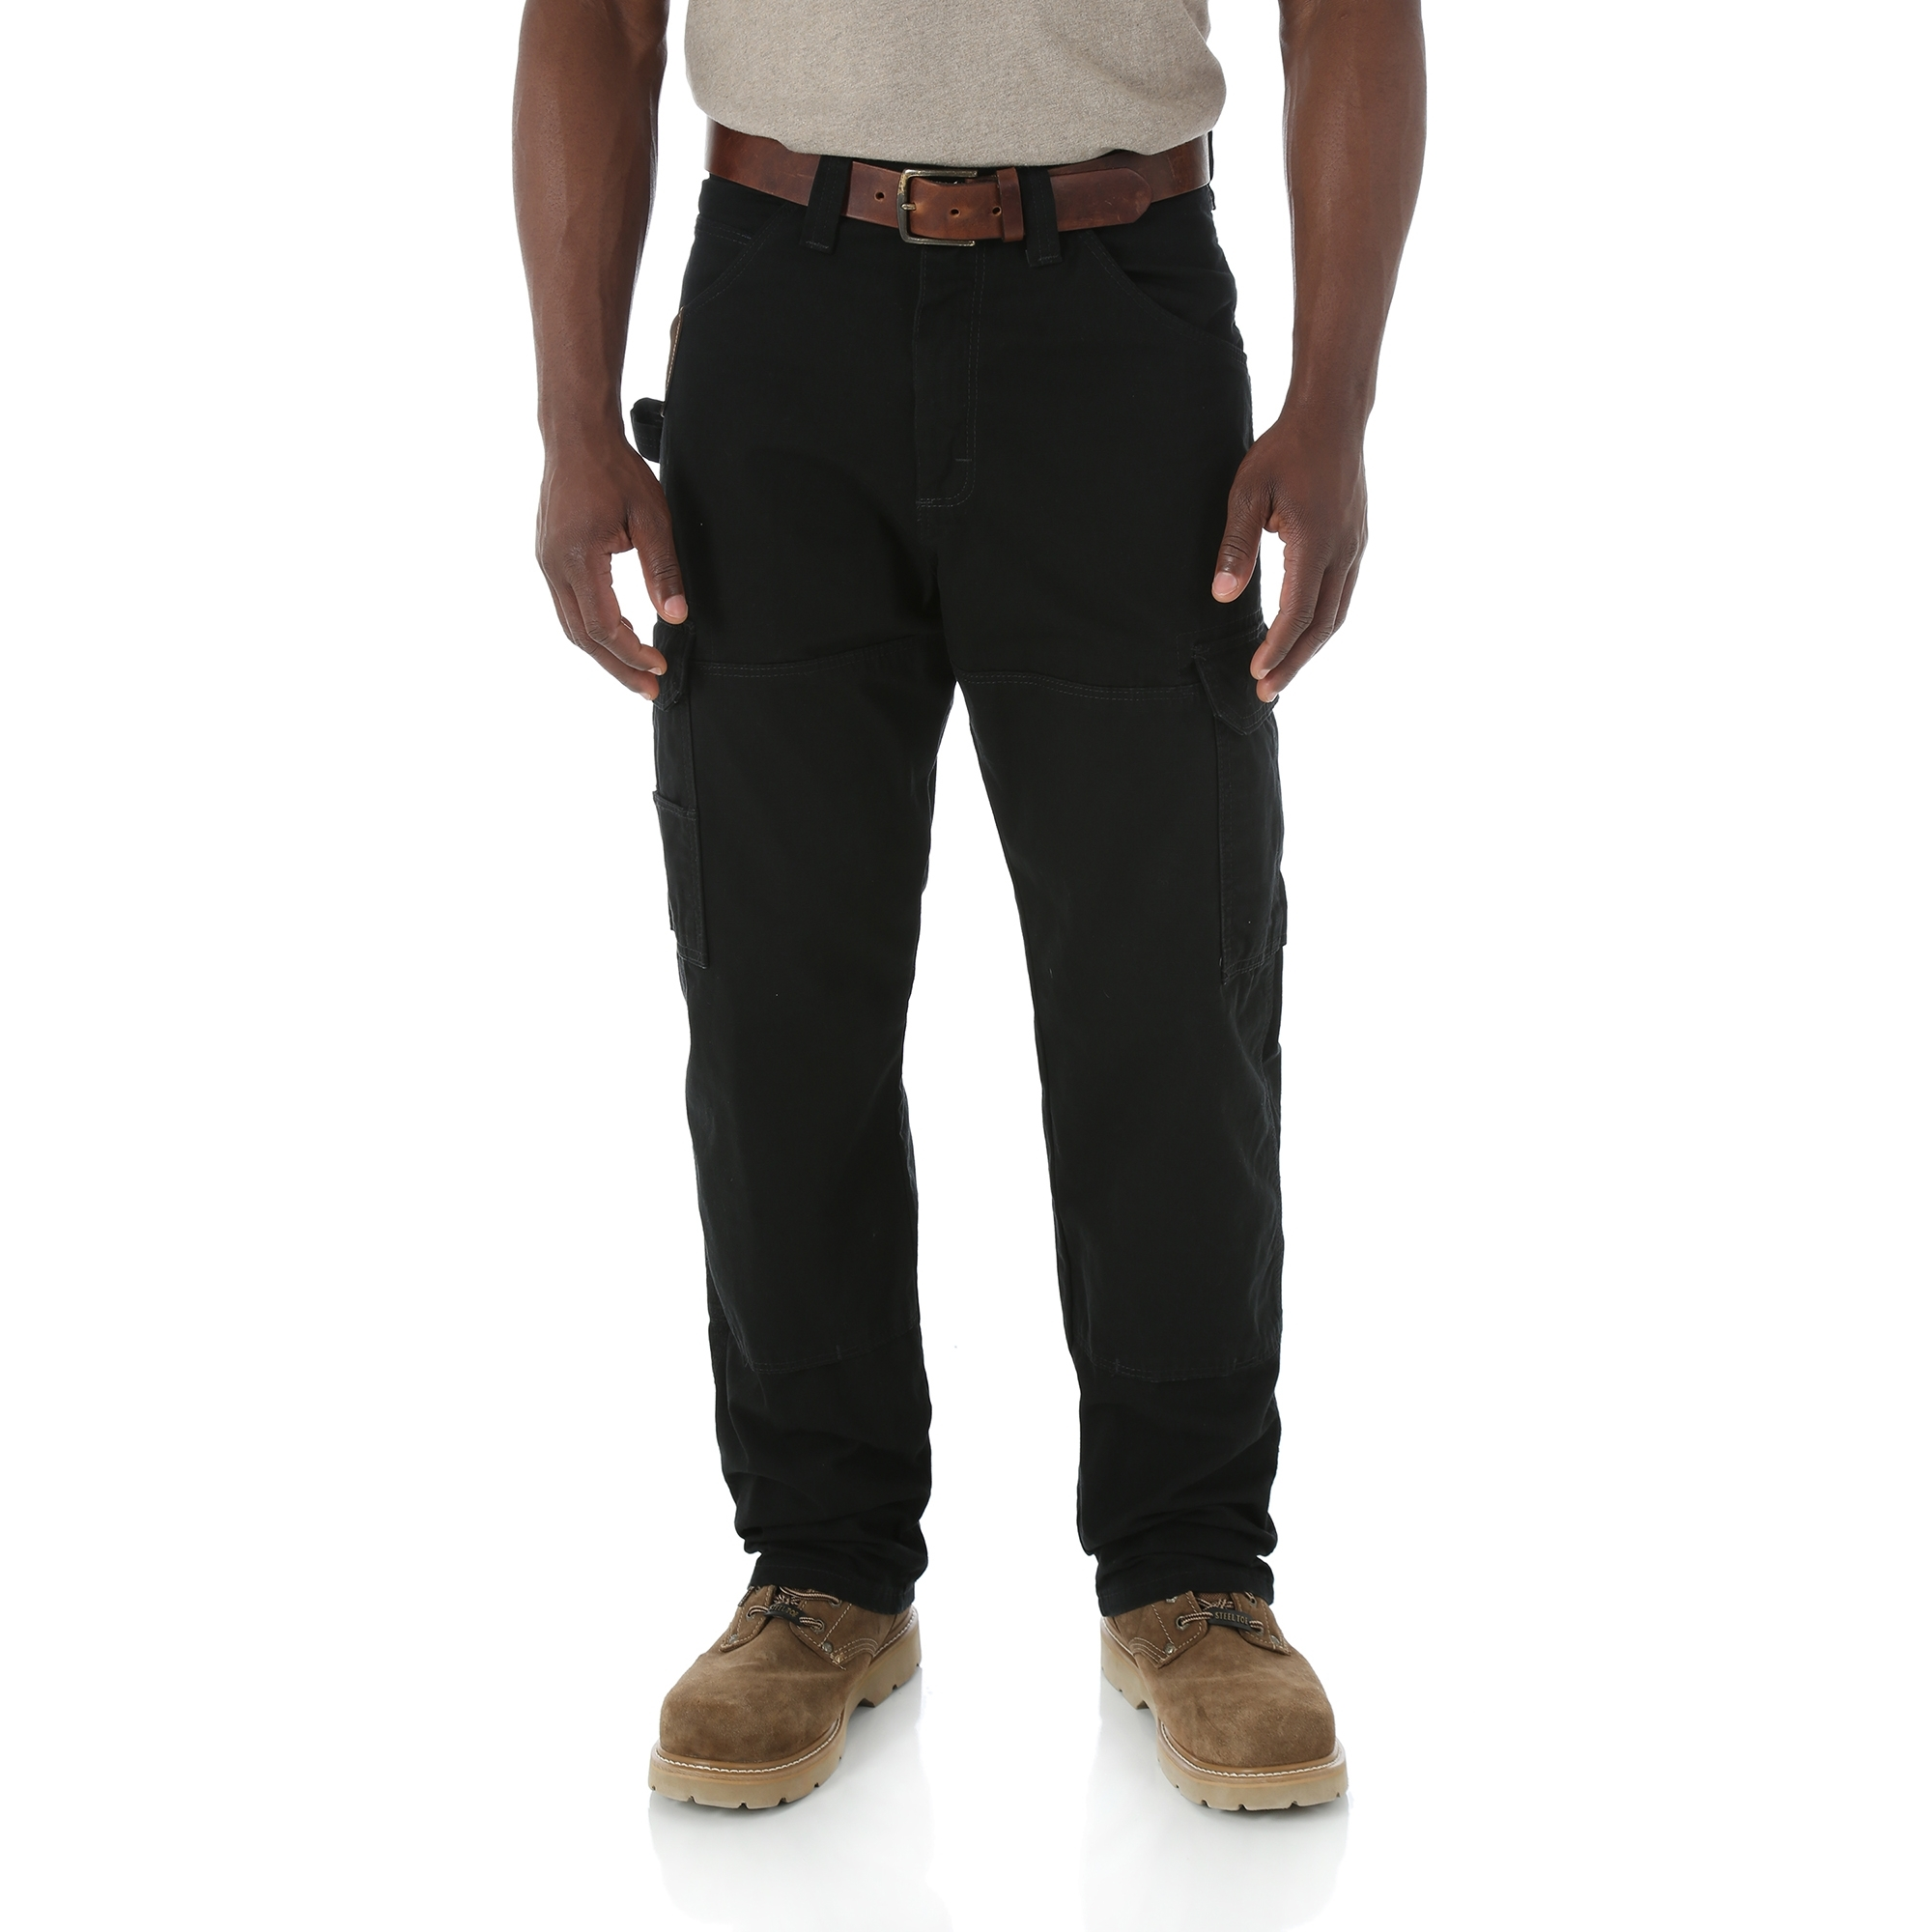 Wrangler RIGGS WORKWEAR Ripstop Ranger Pant - Black